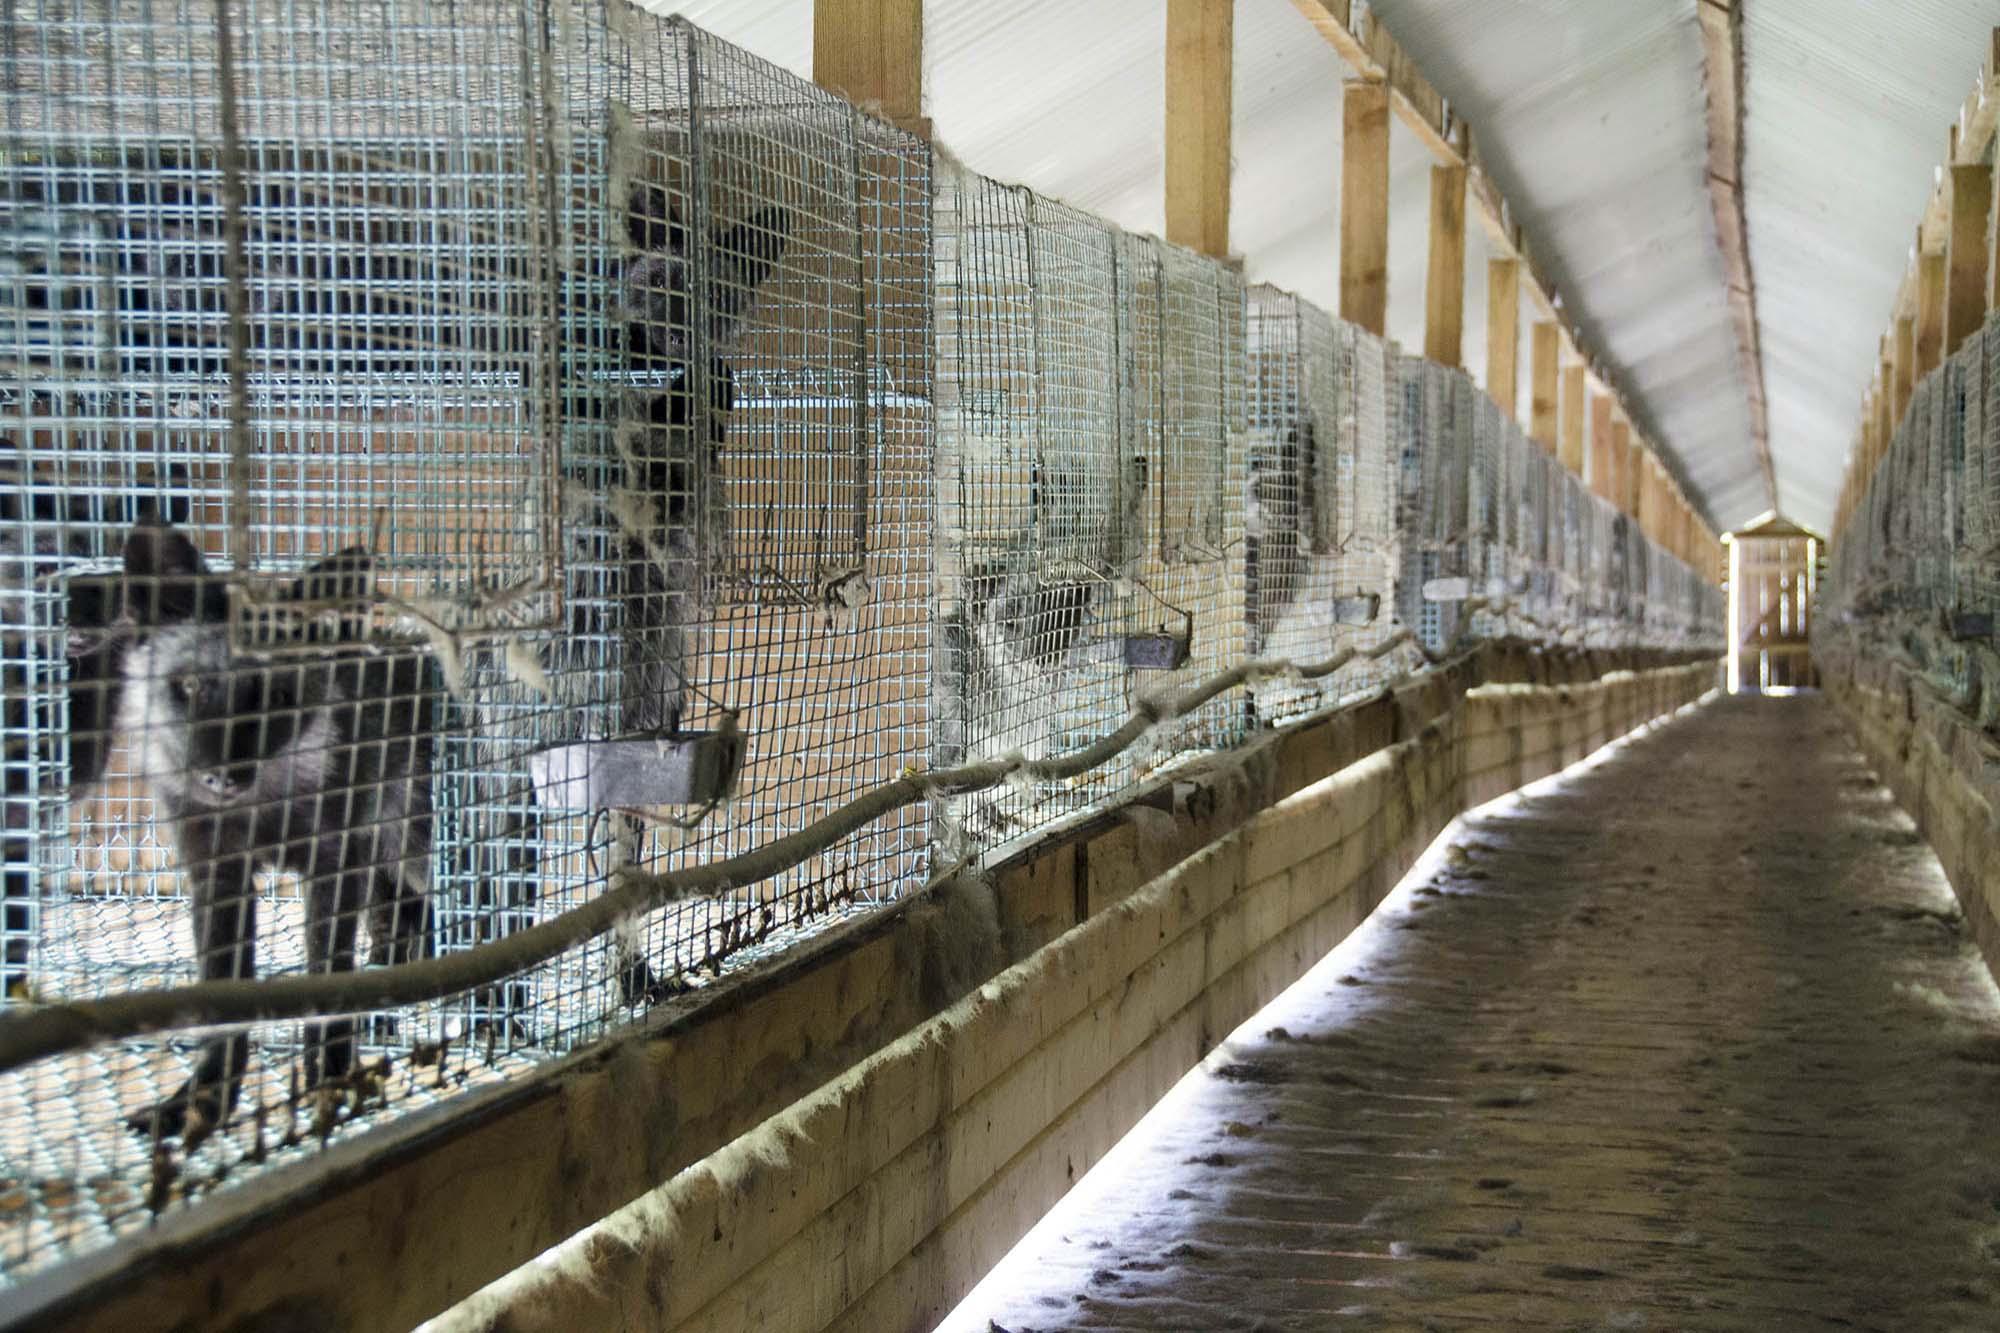 pelsdyr i bur, foto Dyrebeskyttelsen Norge